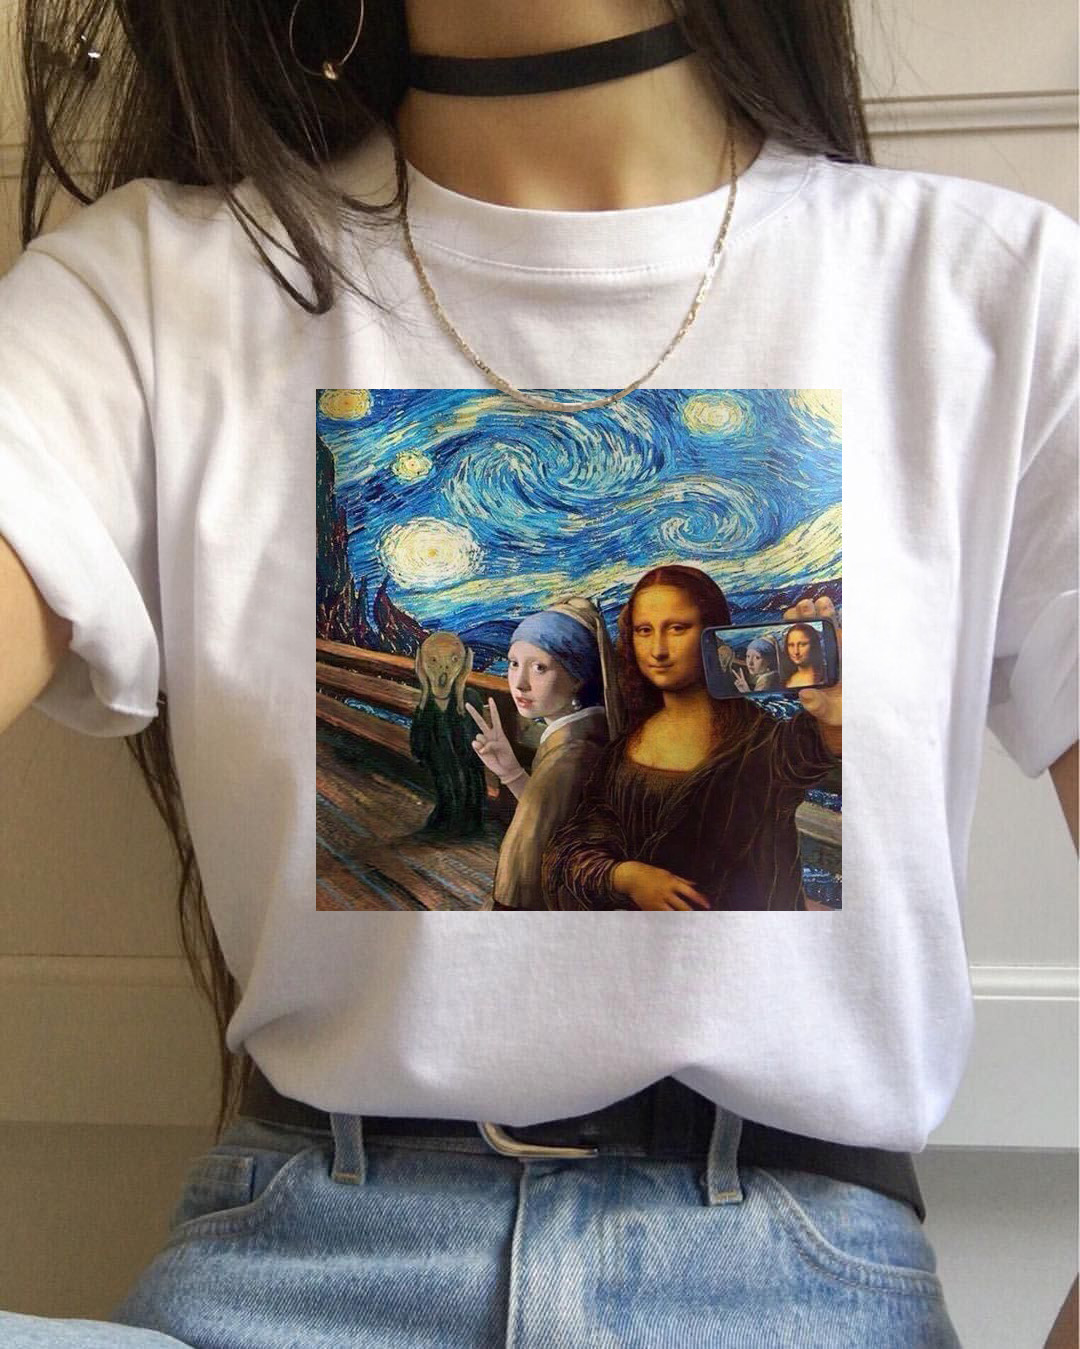 Mona lisa t camisa feminina van gogh engraçado camiseta de topo vogue harajuku 90s streetwear sailor moon casual impresso camiseta feminino